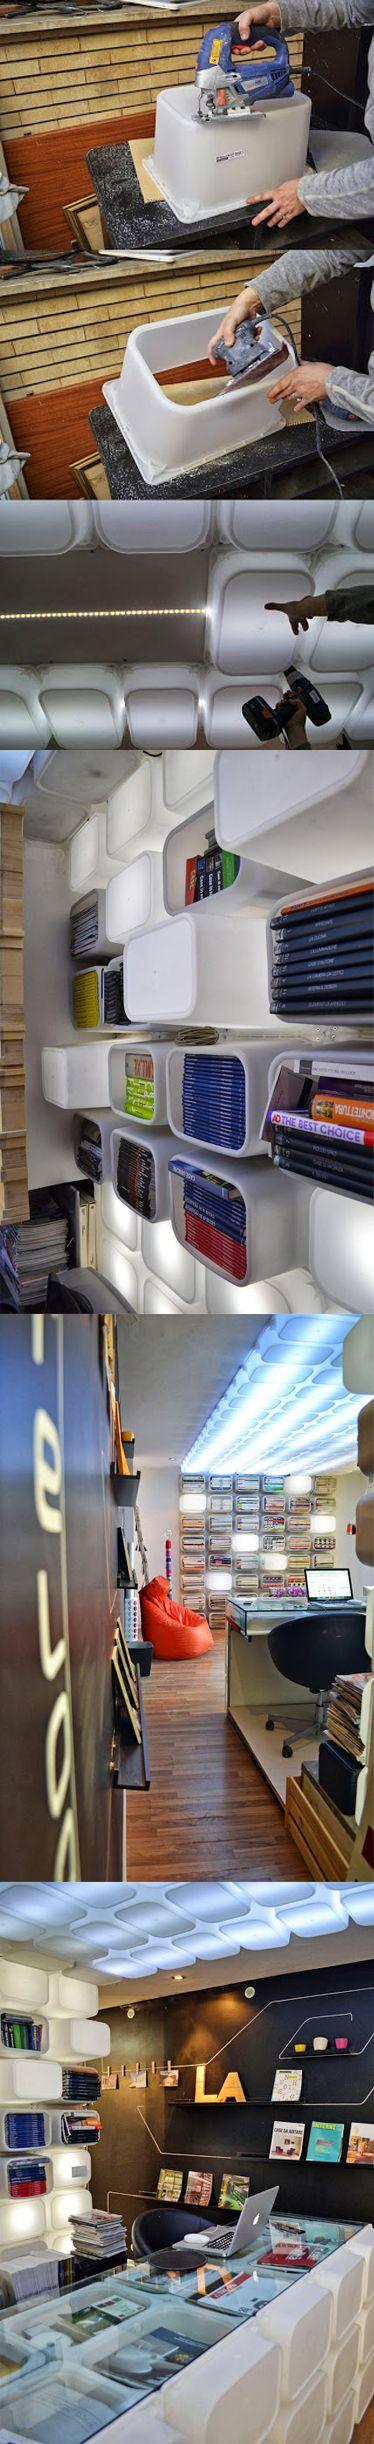 Ingenioso ikea hack con cajas Trofast #futurista